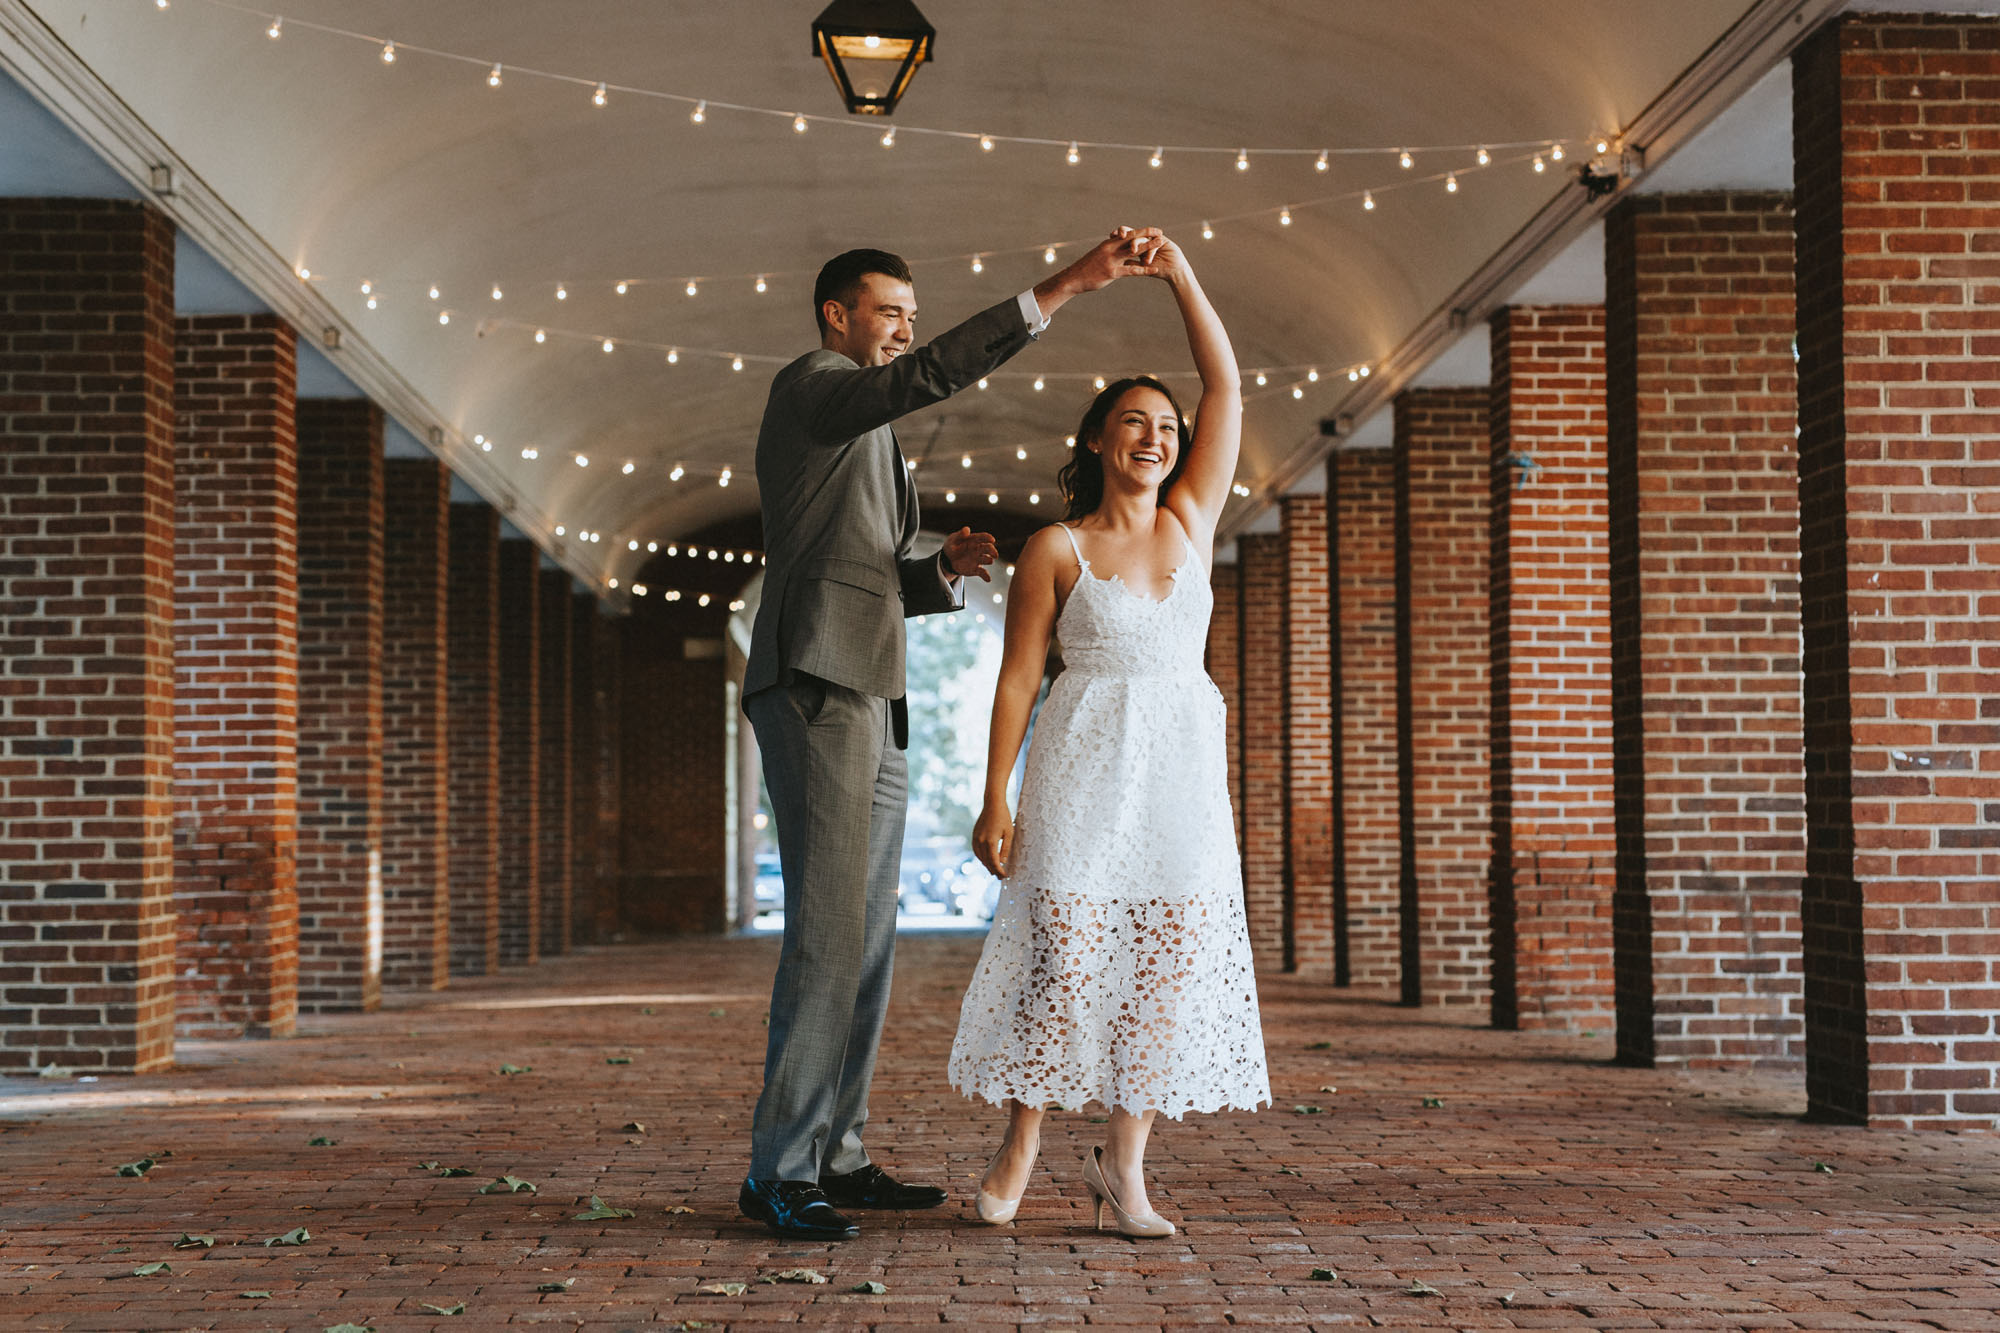 Twisted-Oaks-Studio-Shannon-Billy-Engagement-1.jpg